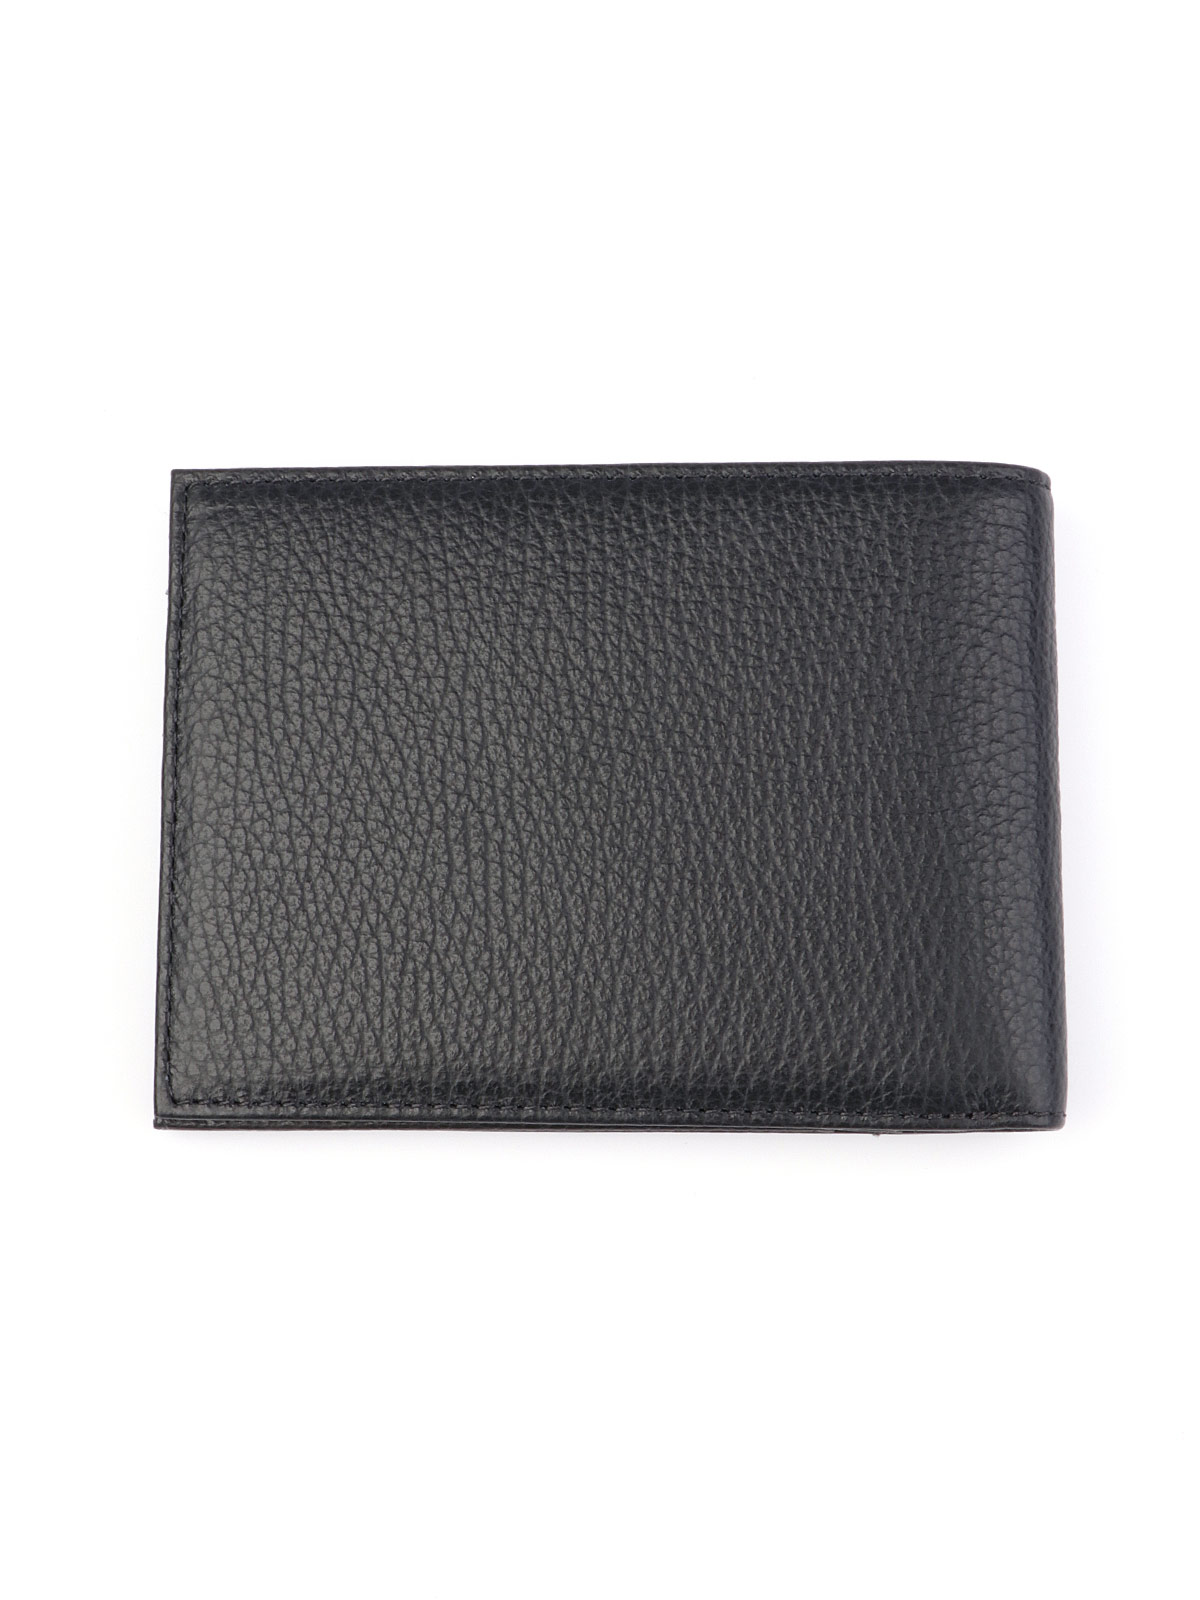 Picture of EMPORIO ARMANI   Men's Tumbled Leather Bi Fold Wallet